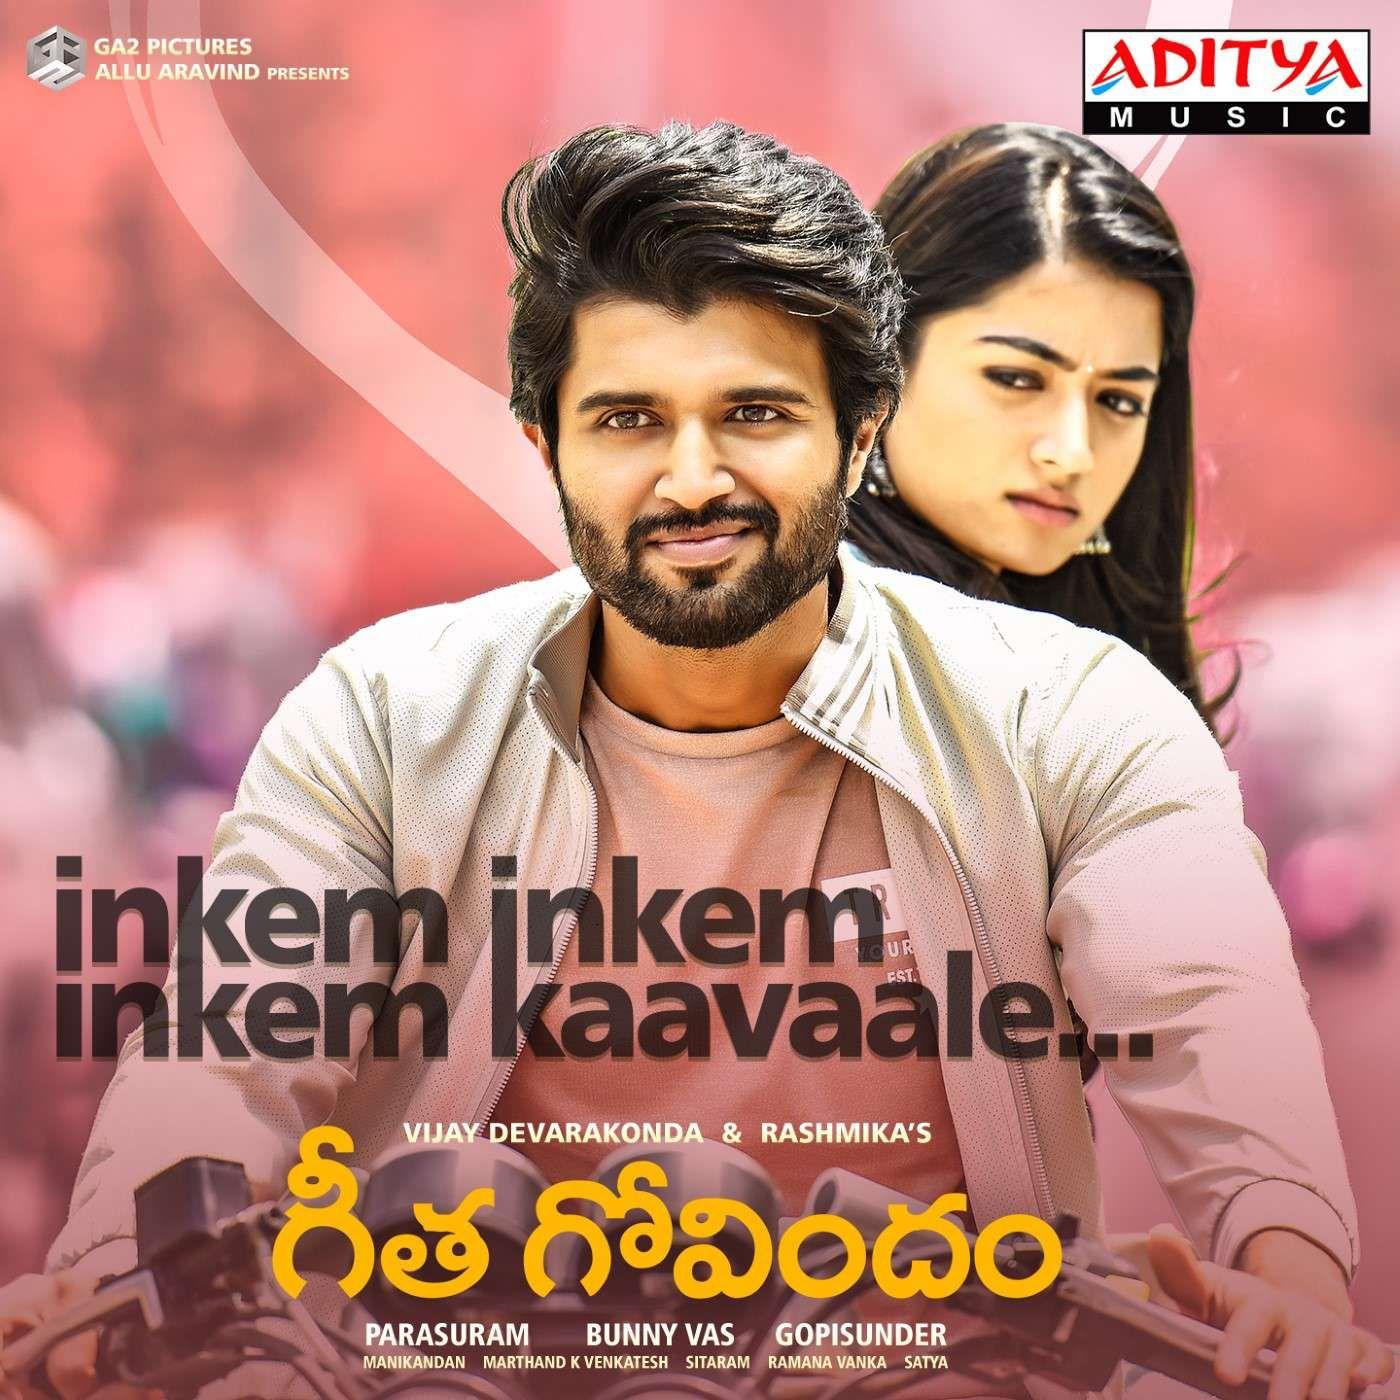 Geetha Govindam 2018 Telugu Mp3 Songs Free Download Audio Songs Free Download Audio Songs Songs